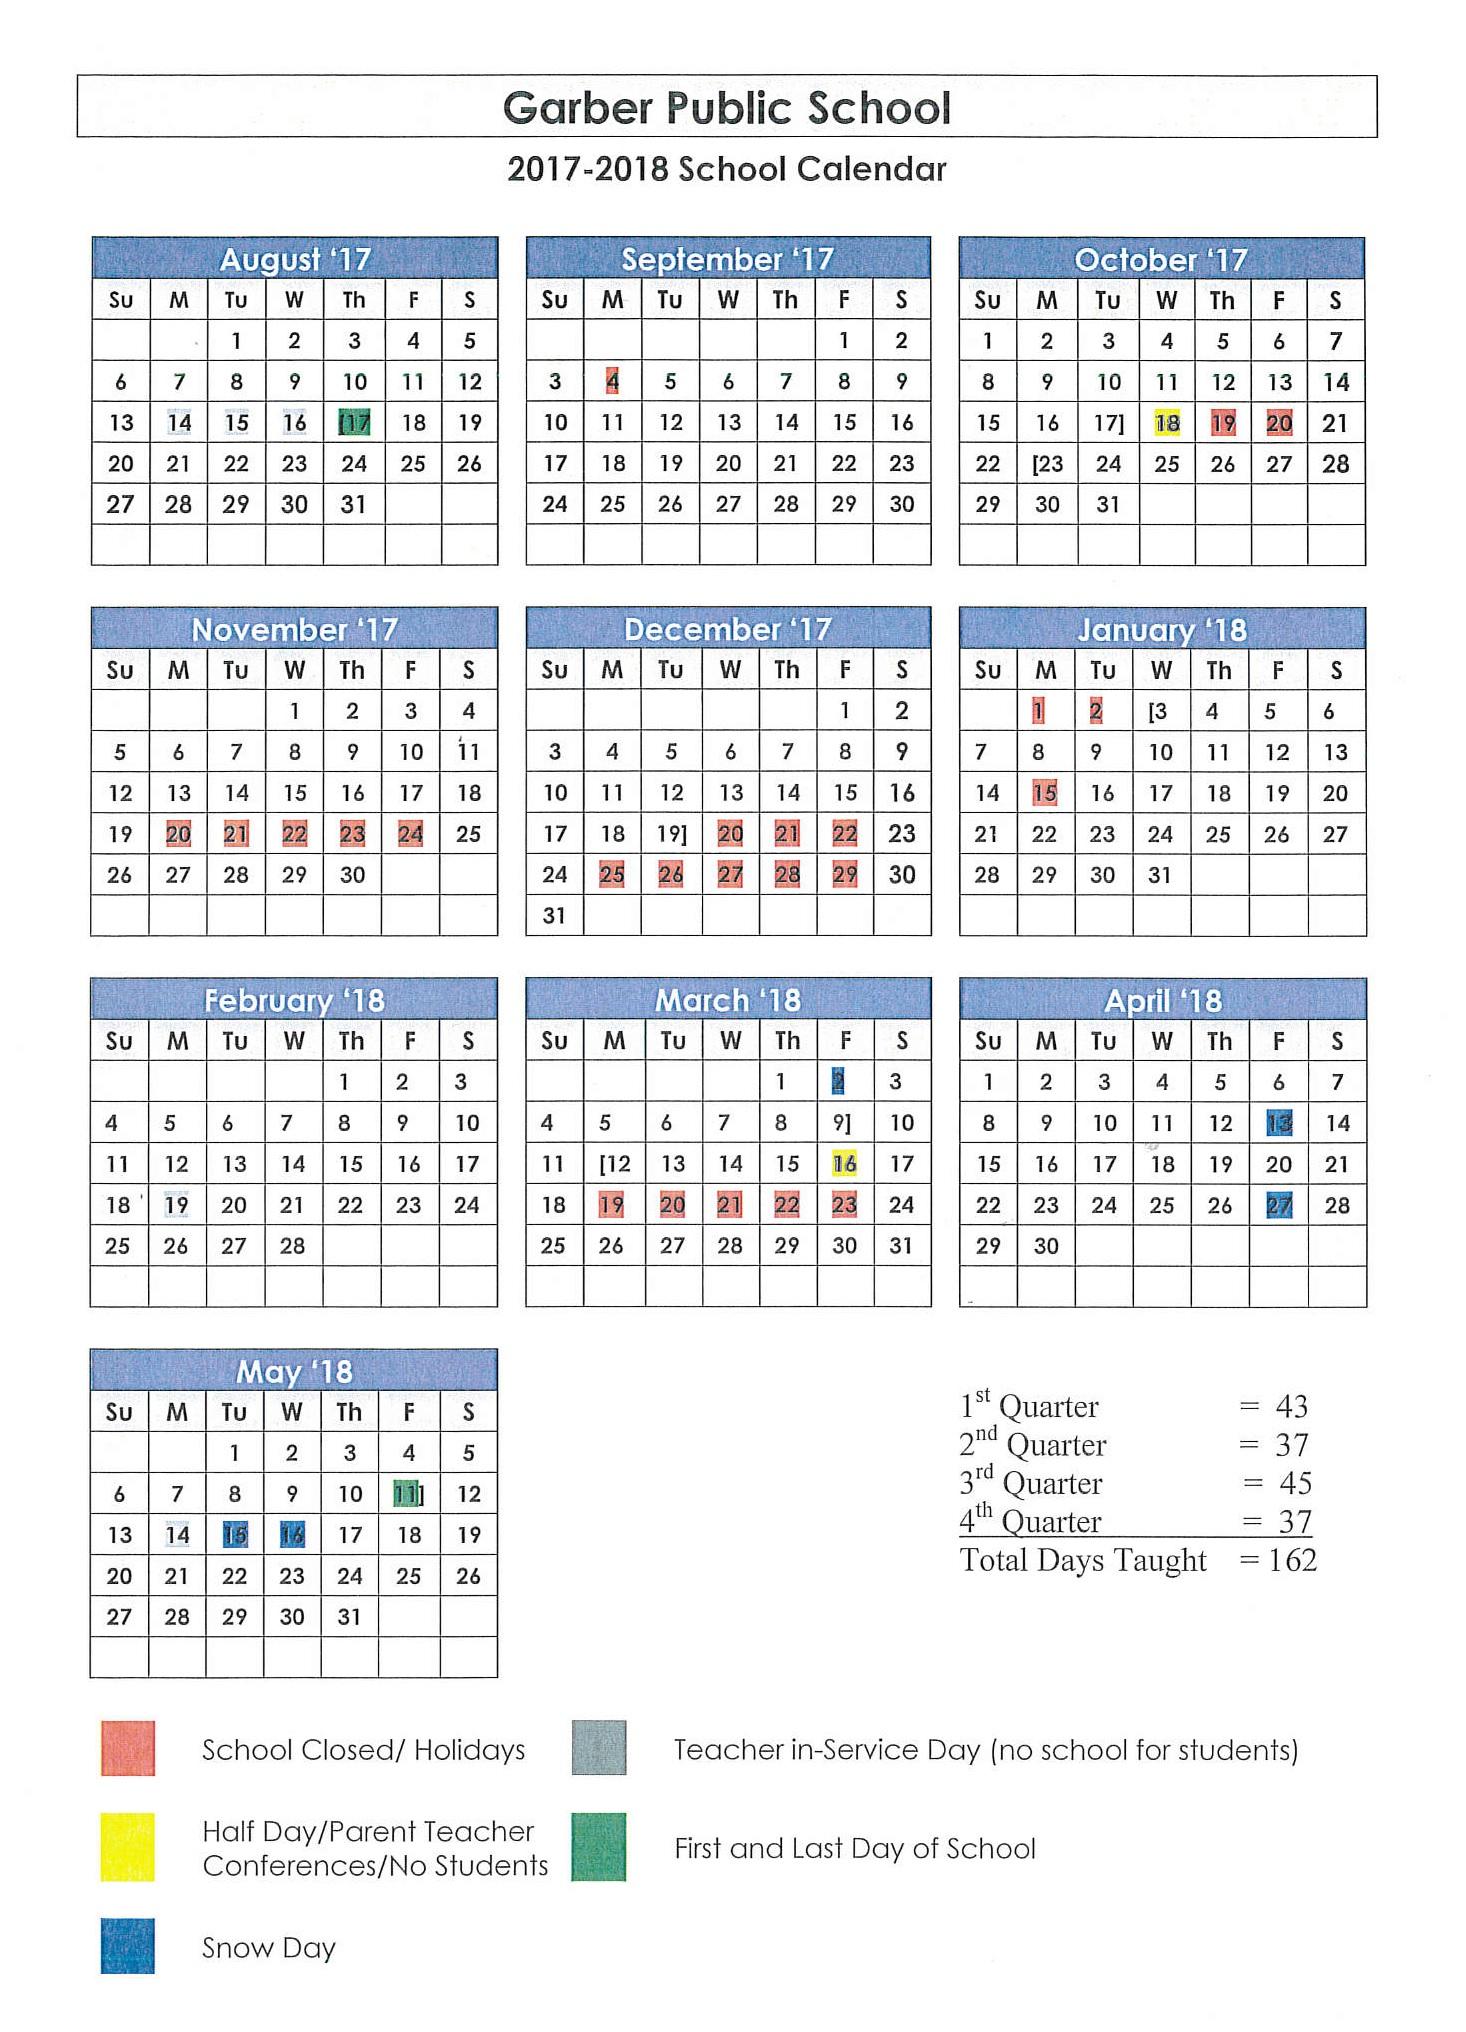 17-18 School Calendar